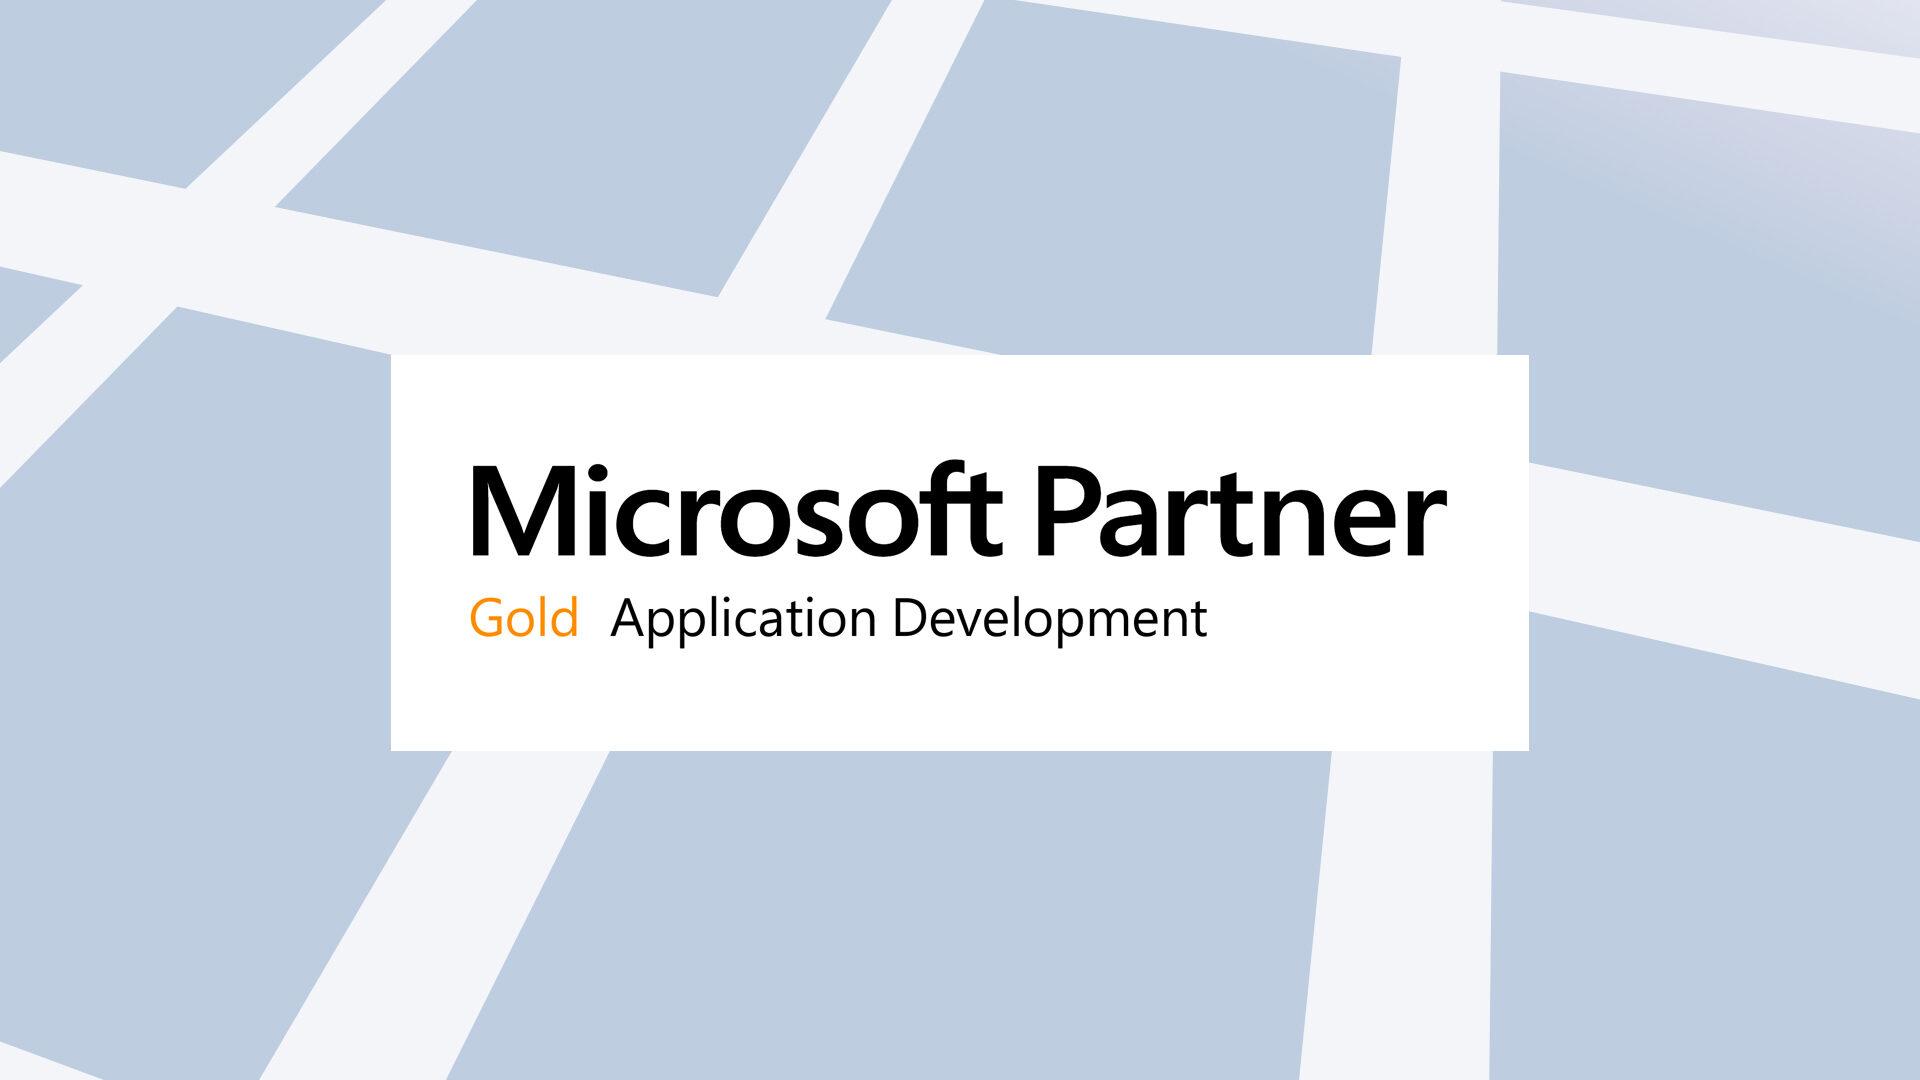 Ne microsoft partner gold application development 1920x1080